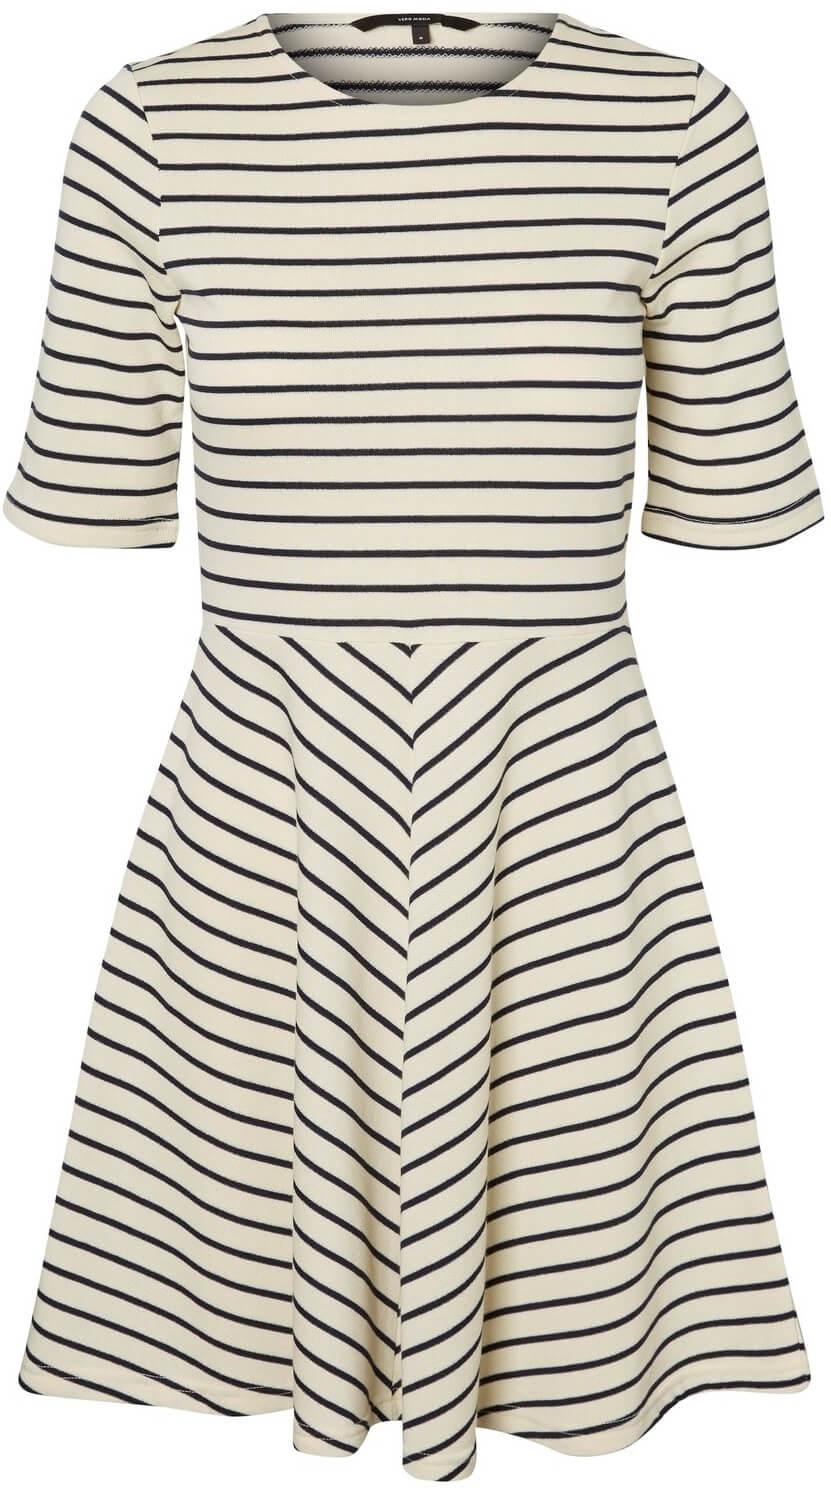 0f47a23024628 Vero Moda Dámske šaty Ula 2/4 Short Dress A Snow White Night Sky ...